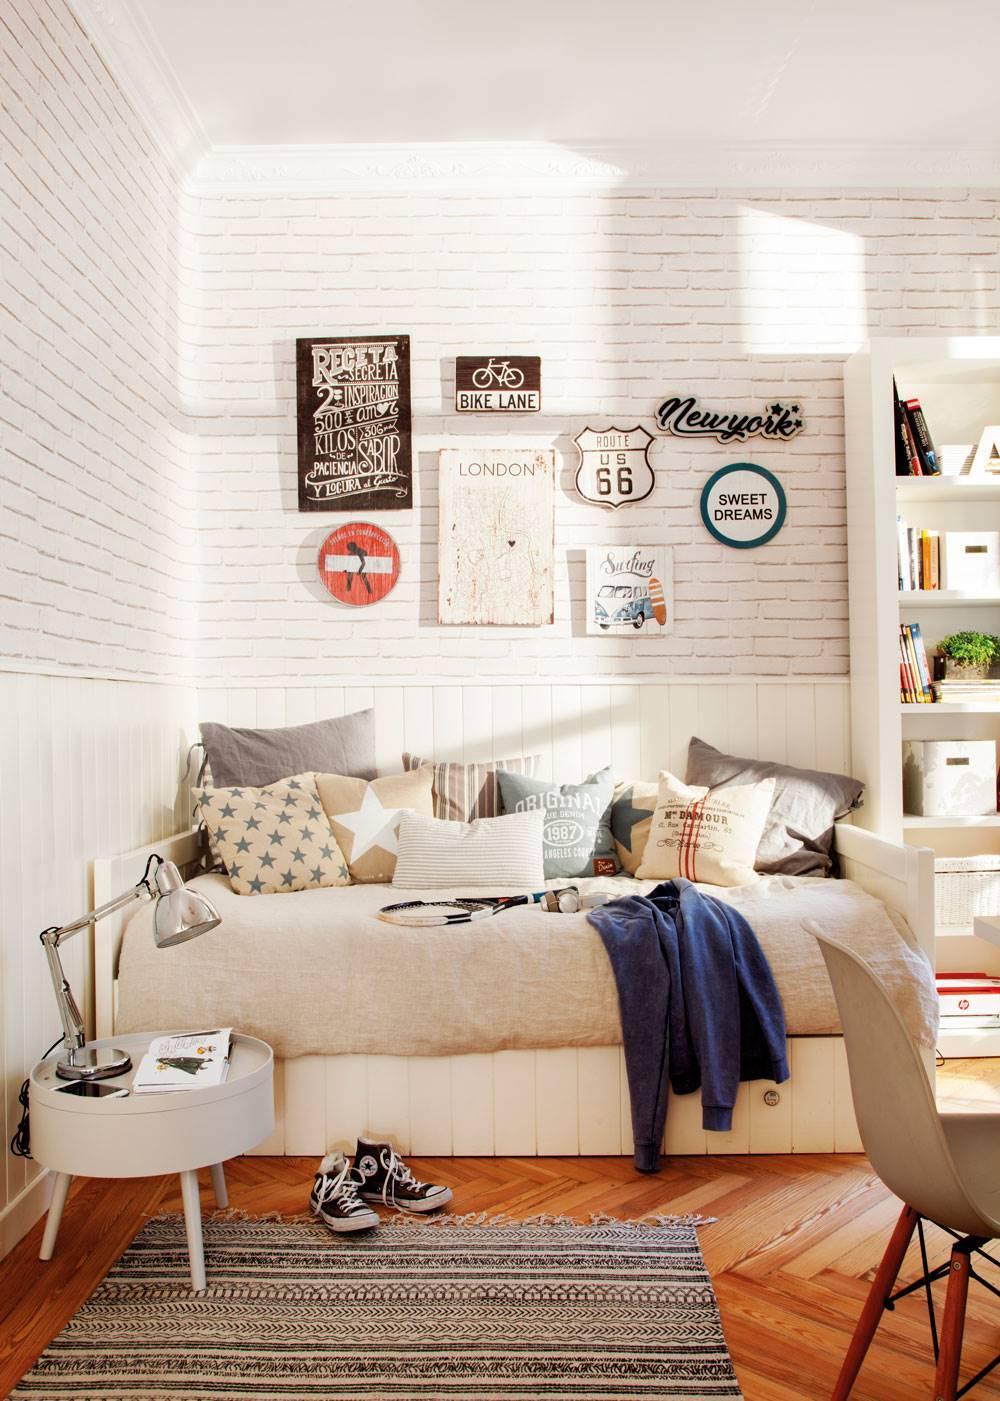 60 Papeles Pintados Para Decorar Y Sumar Calidez A Tu Casa